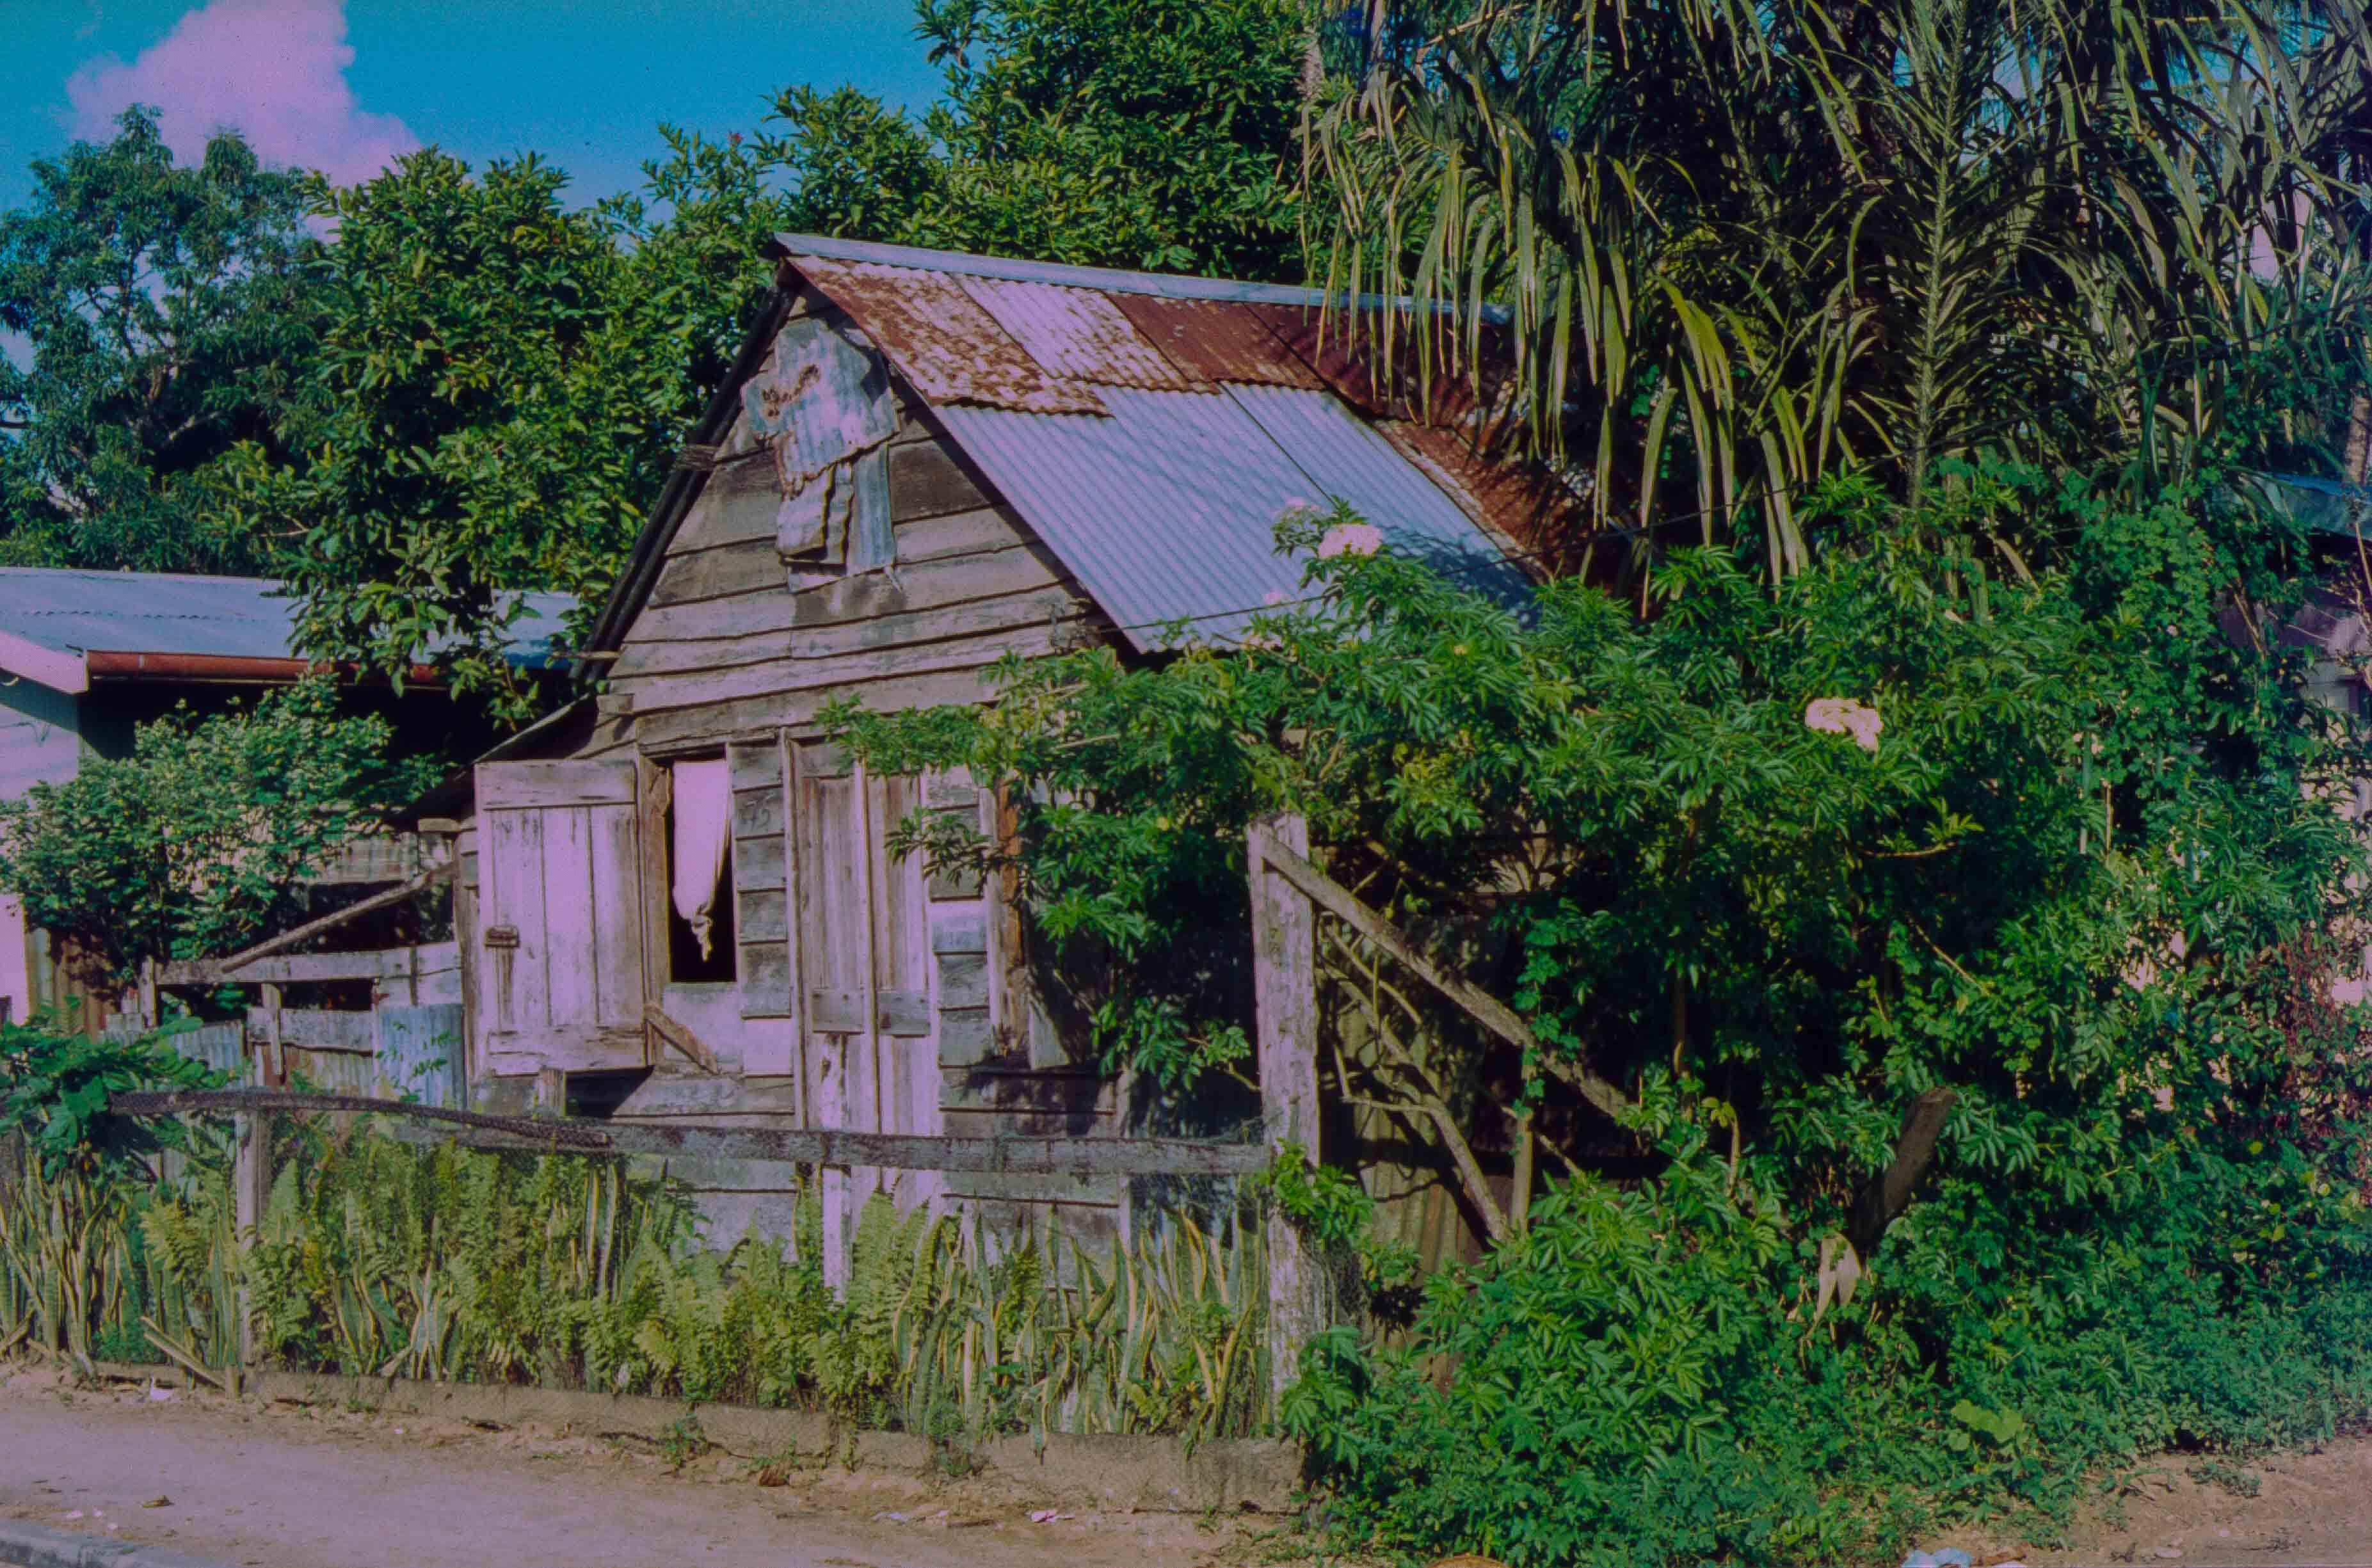 190. Suriname